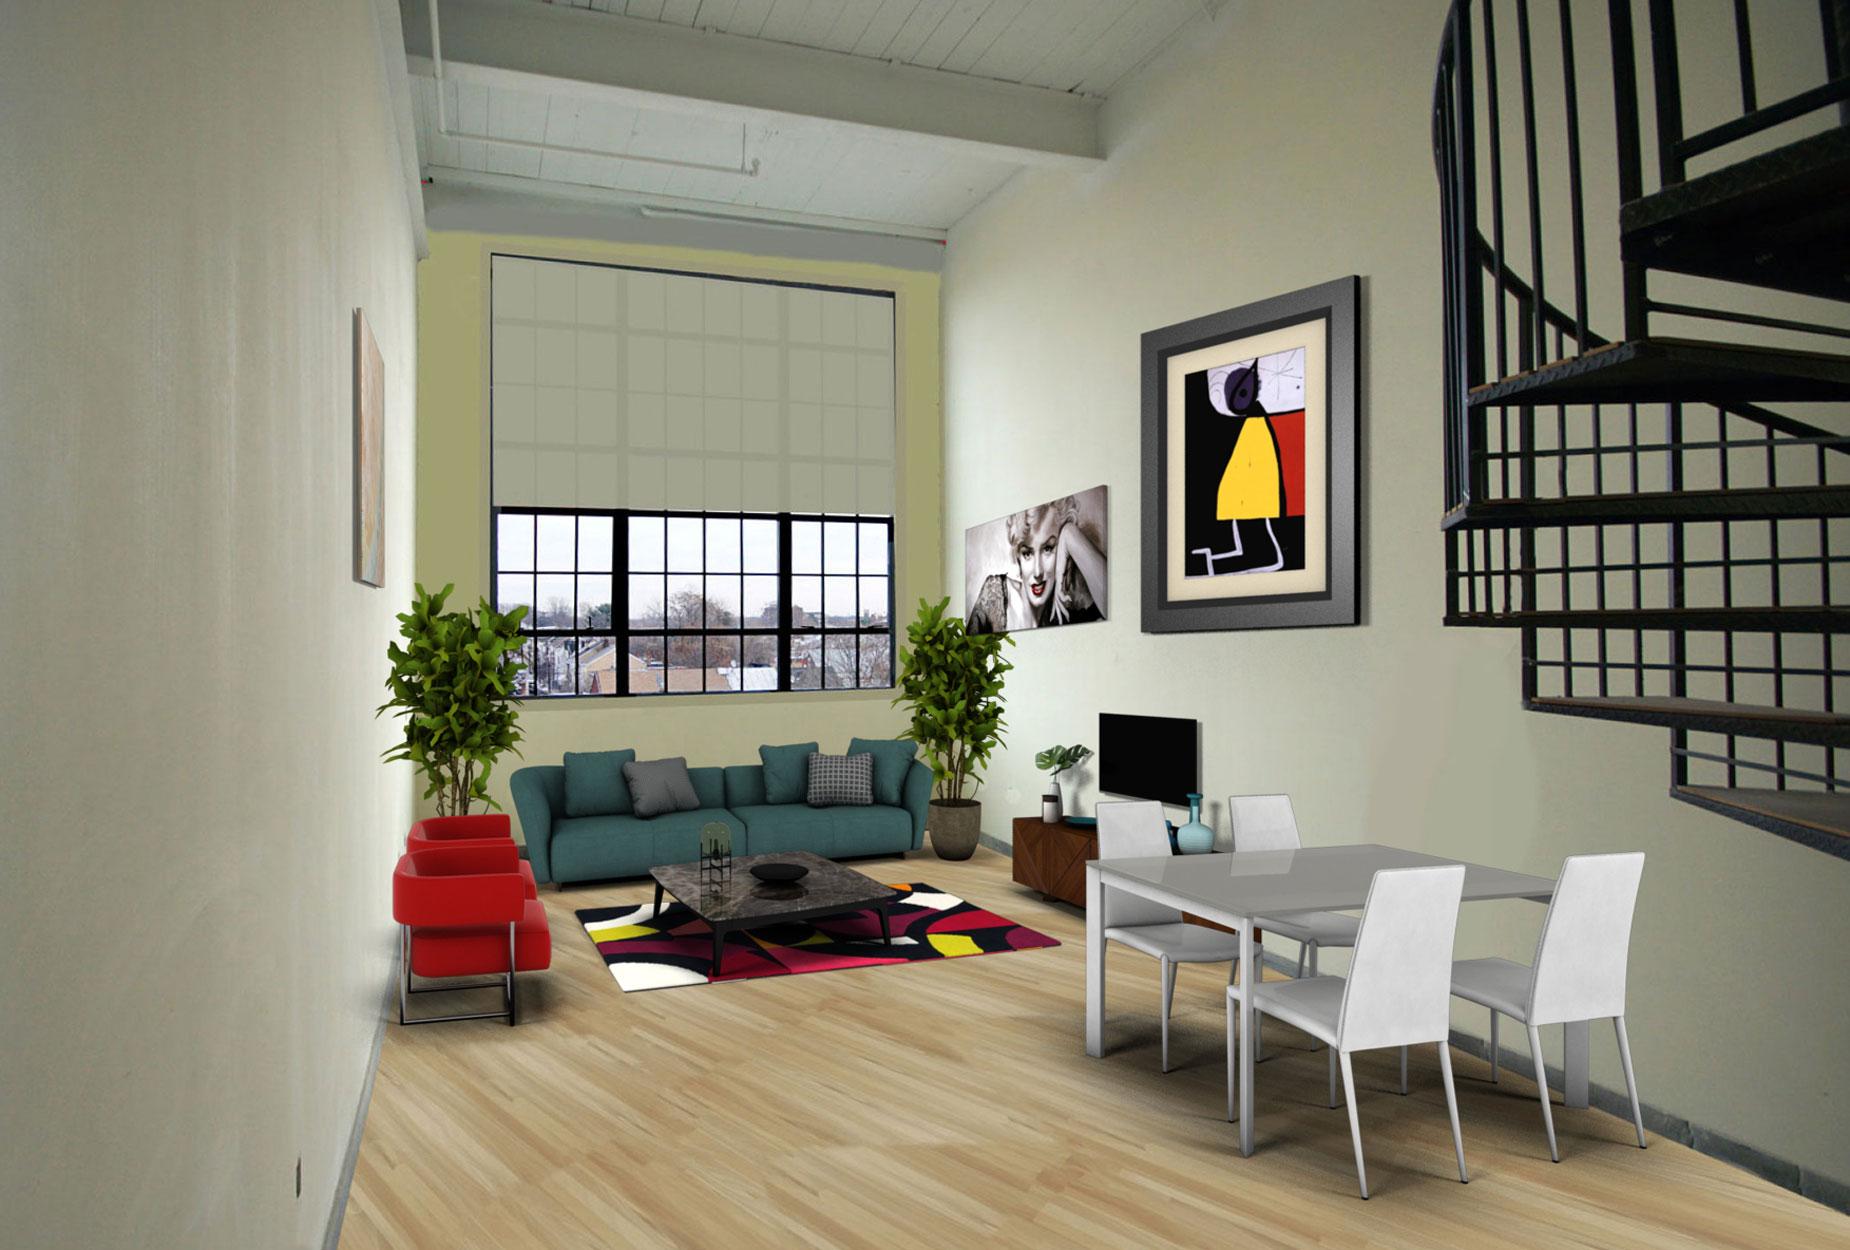 Looky looky roebling lofts - The wonder loft a visual experiment in manhattan ...